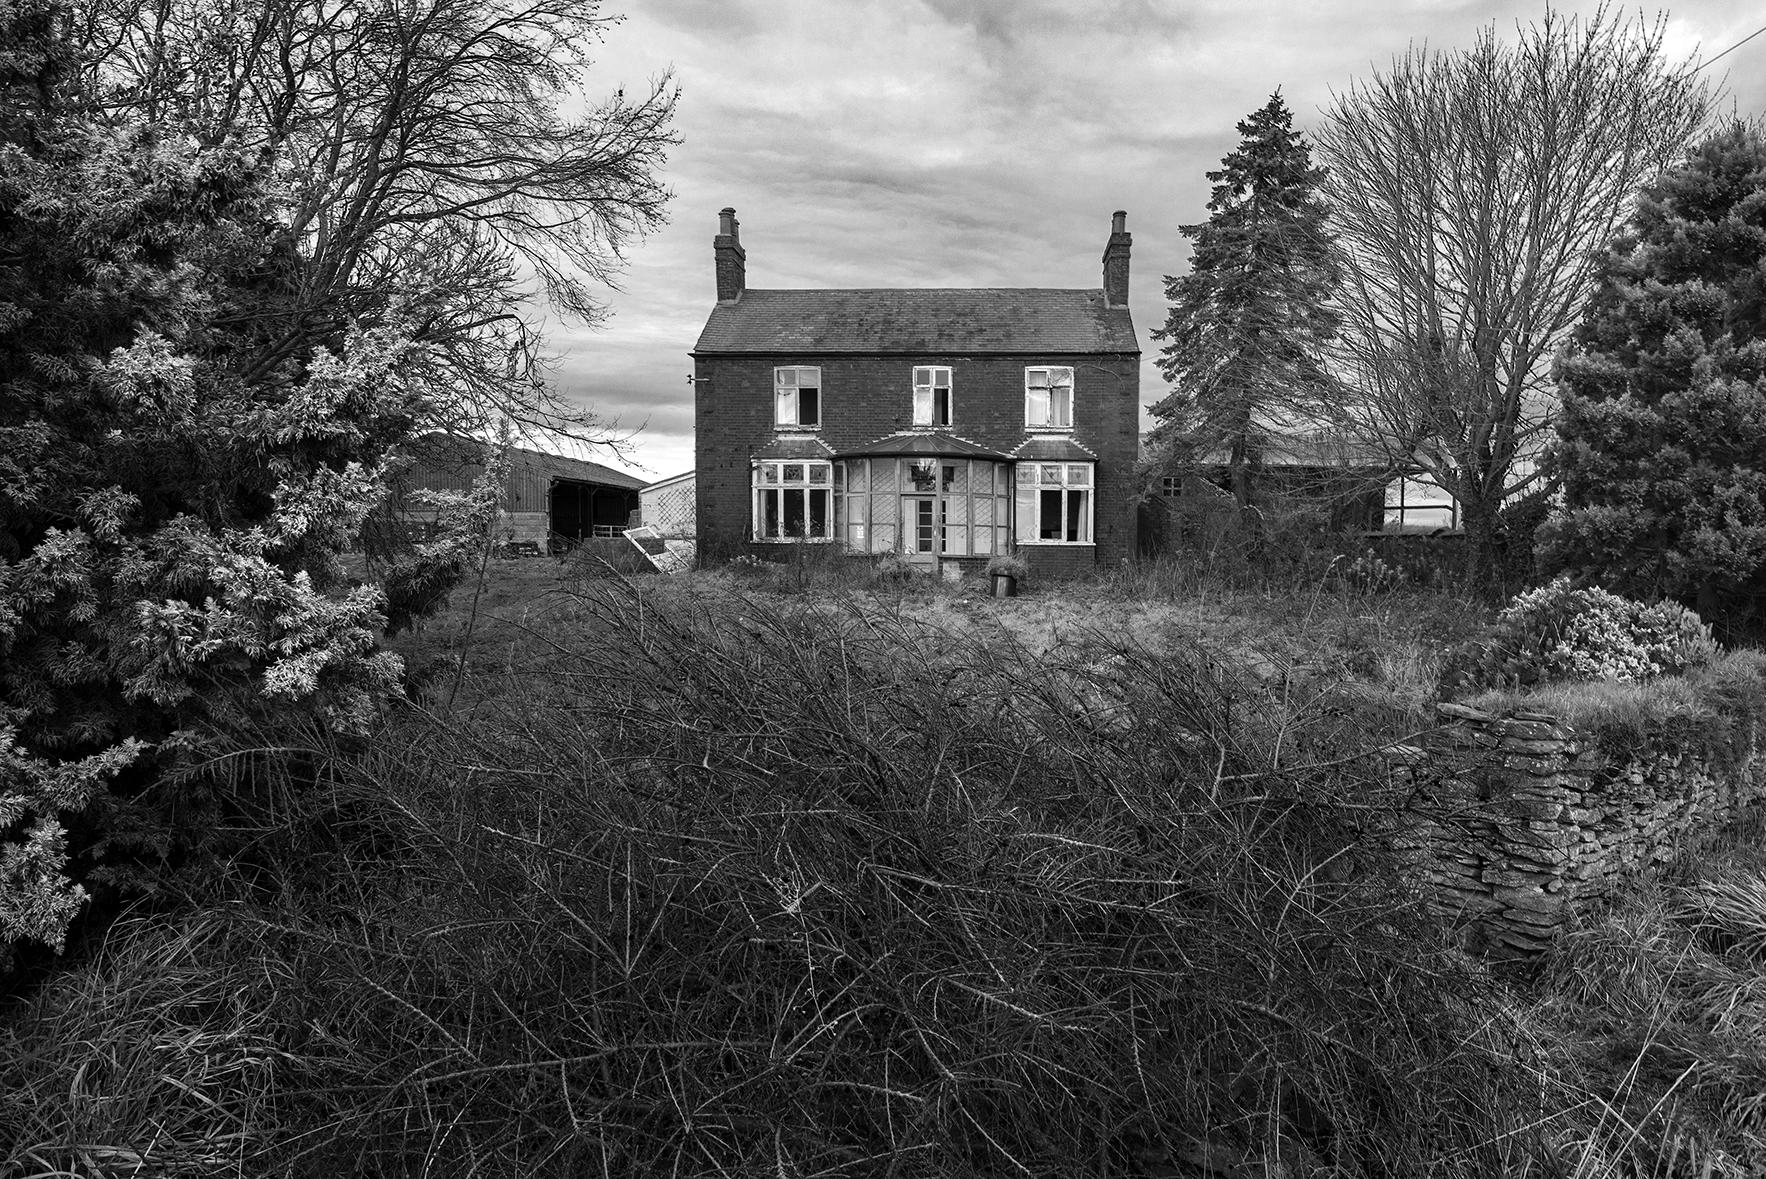 The Postman's House